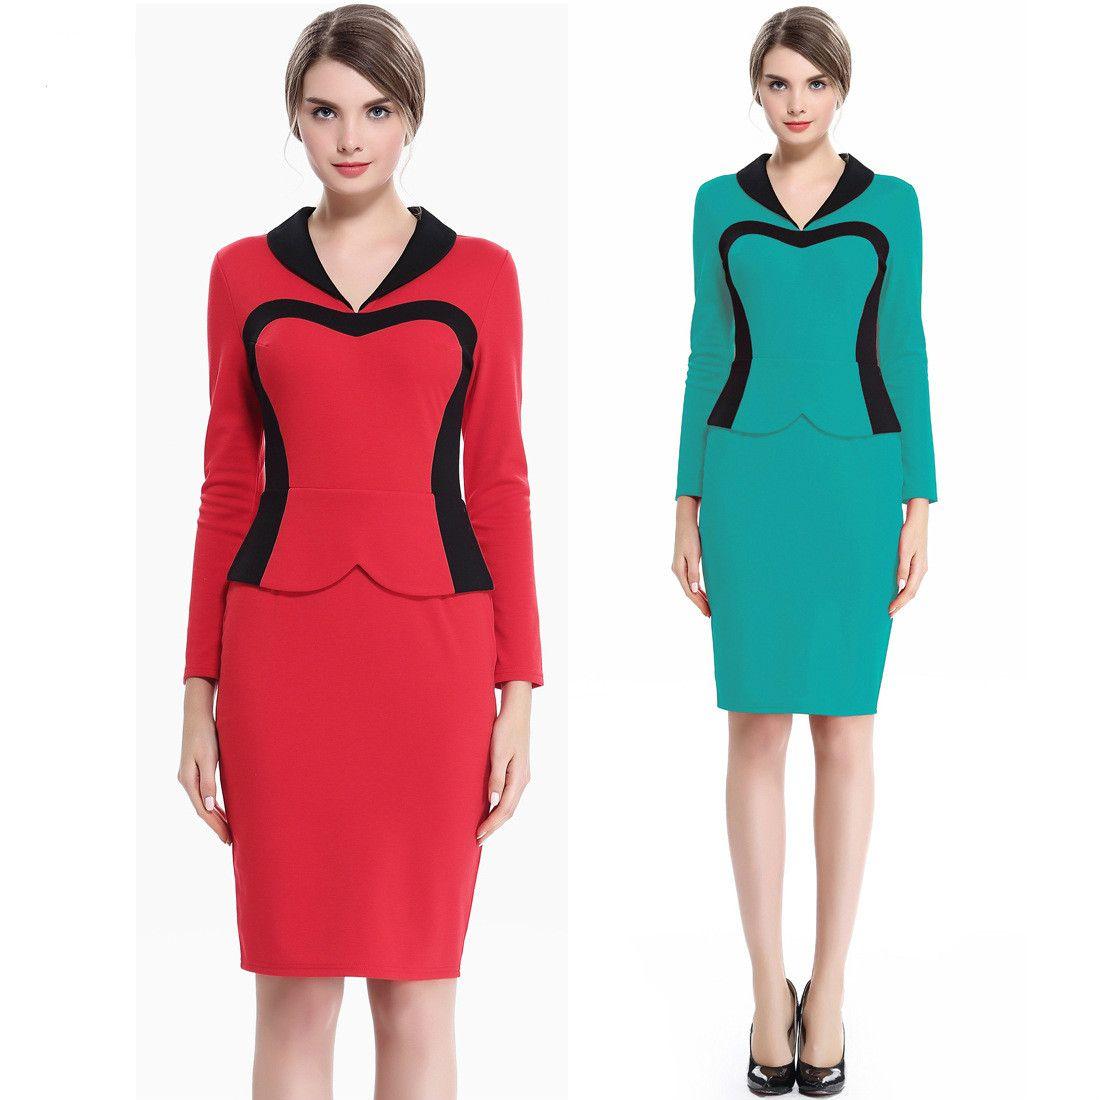 Work Clothing Lady Elegant Long Sleeve Career Dresses Slim High Waist  Bodycon Pencil Dress Plus Size